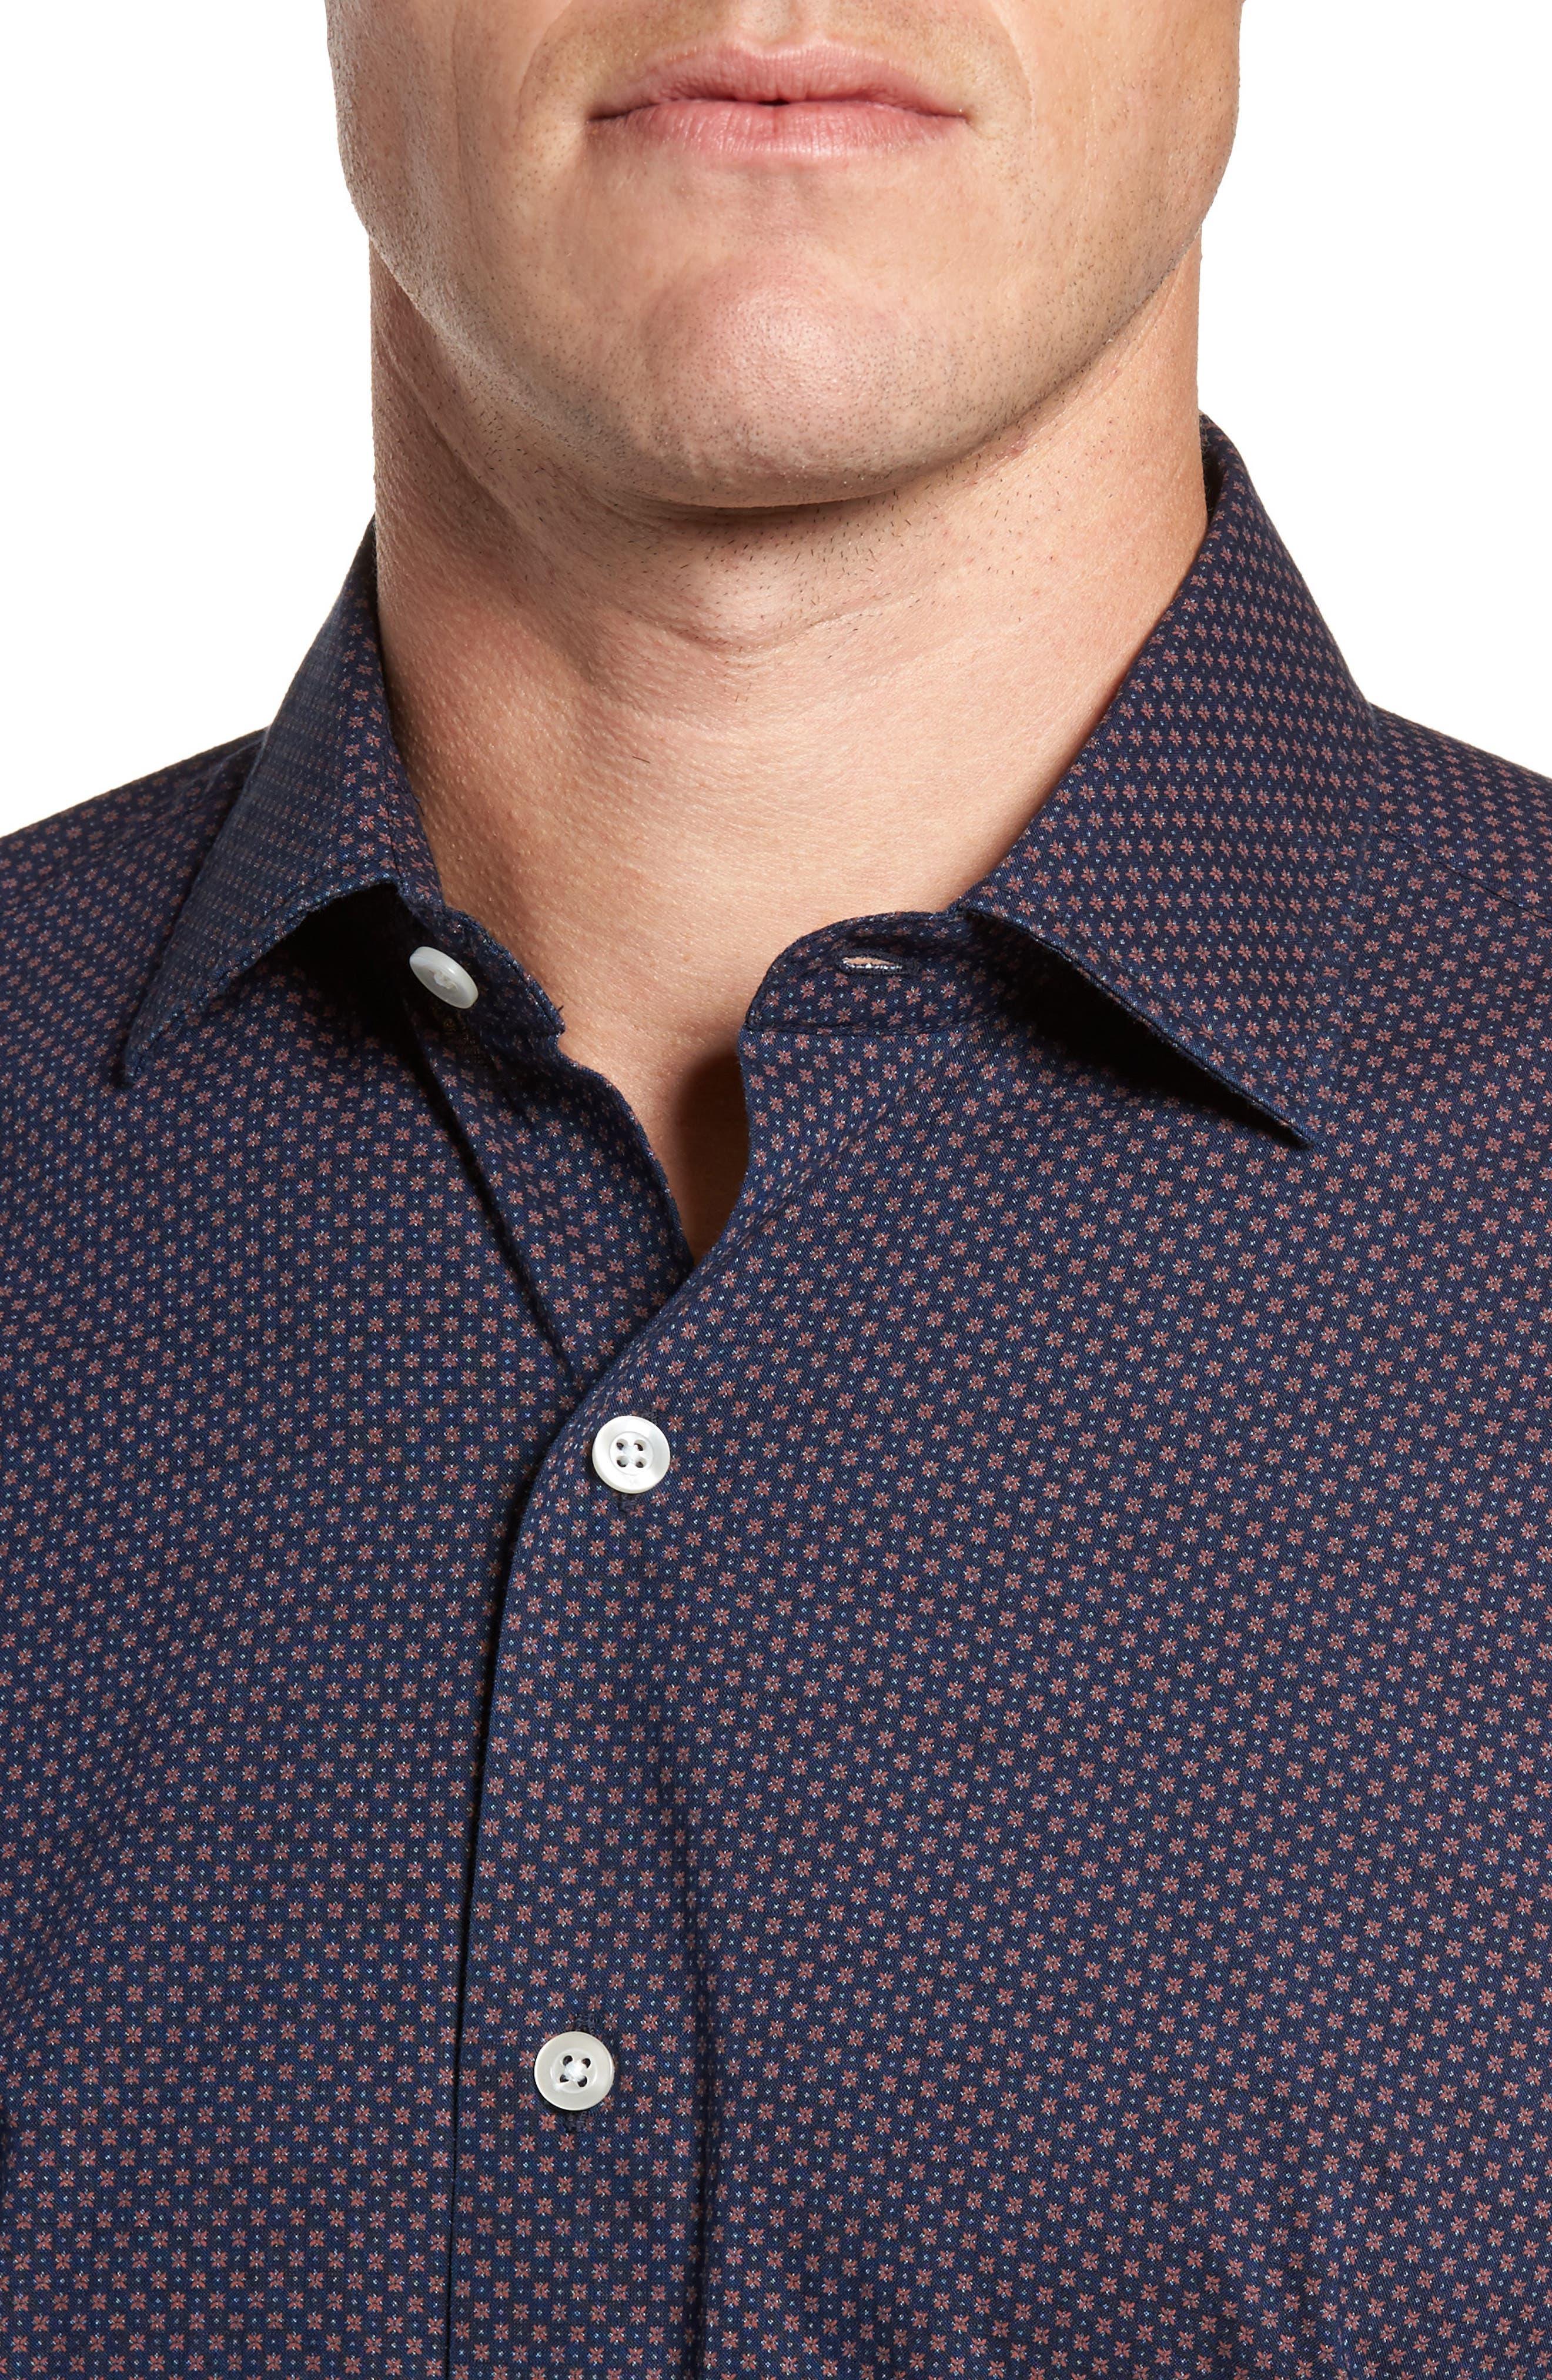 Dyed Print Sport Shirt,                             Alternate thumbnail 4, color,                             Navy